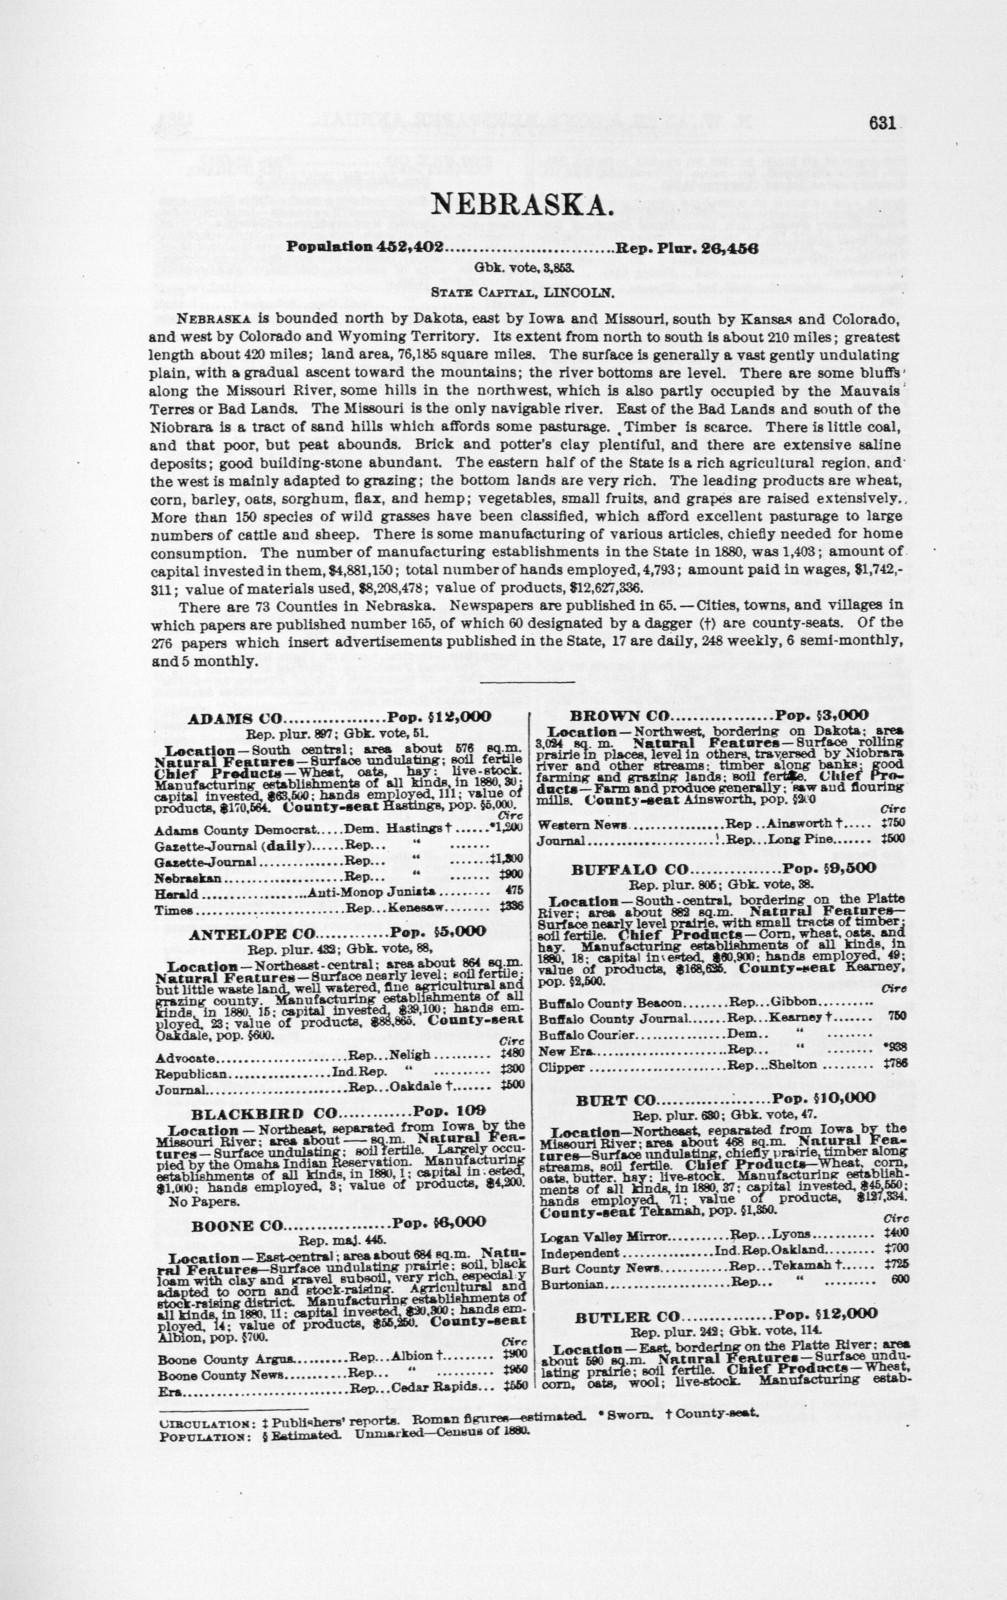 N.W. Ayer & Son's American newspaper annual.1908.Part III.